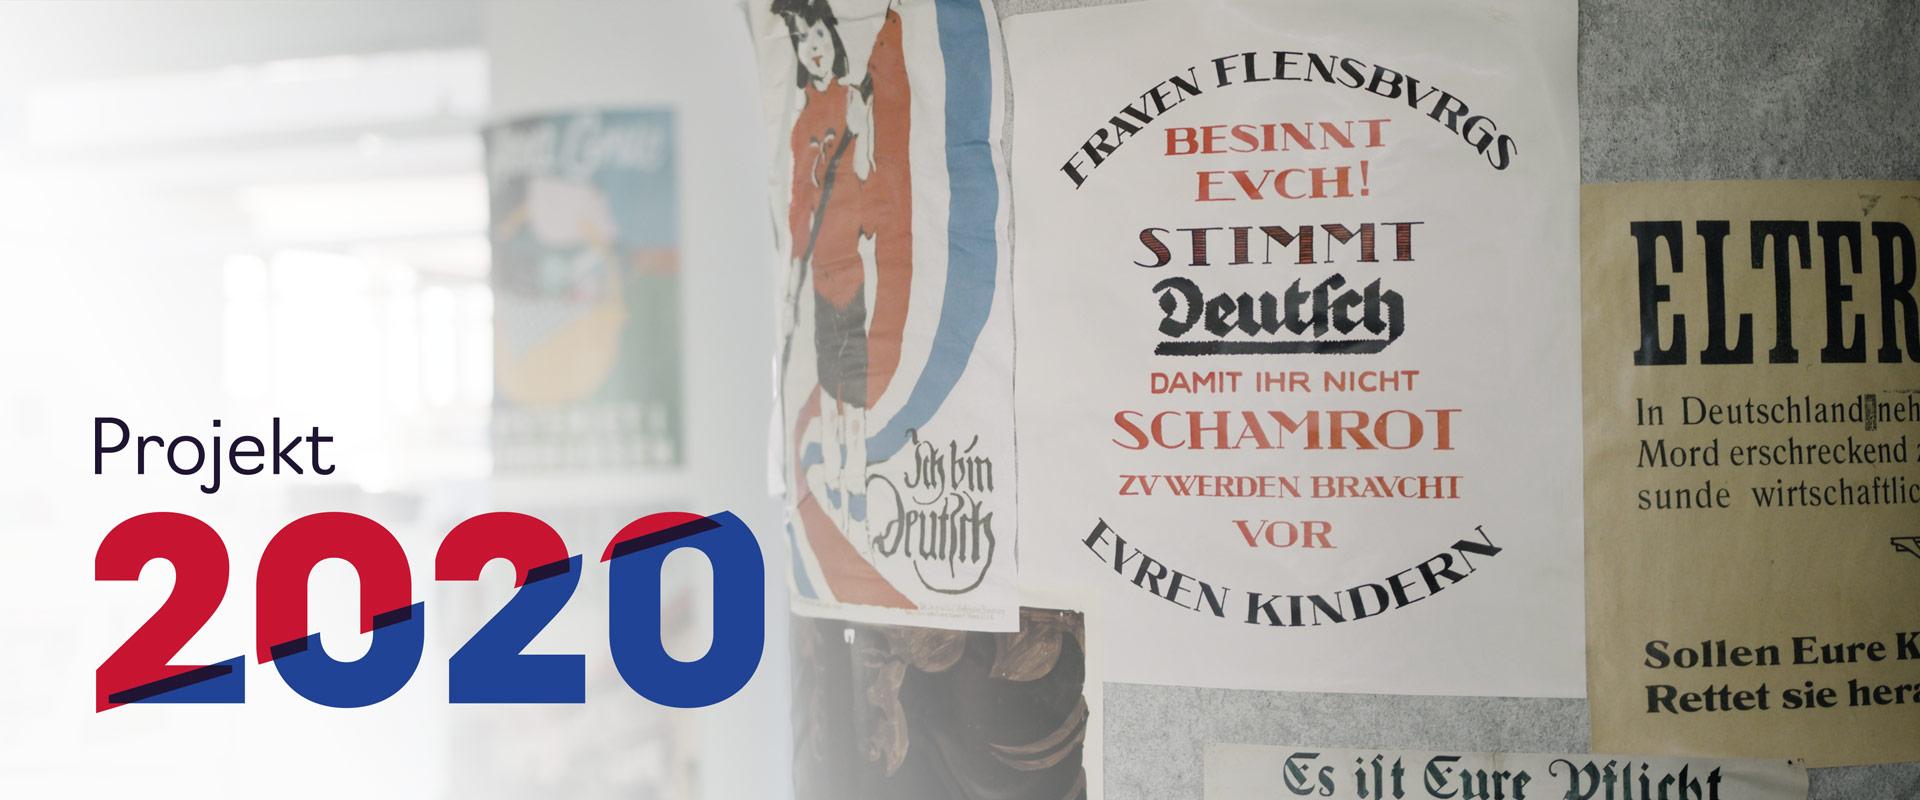 Projekt 2020 - Teil 10 Video